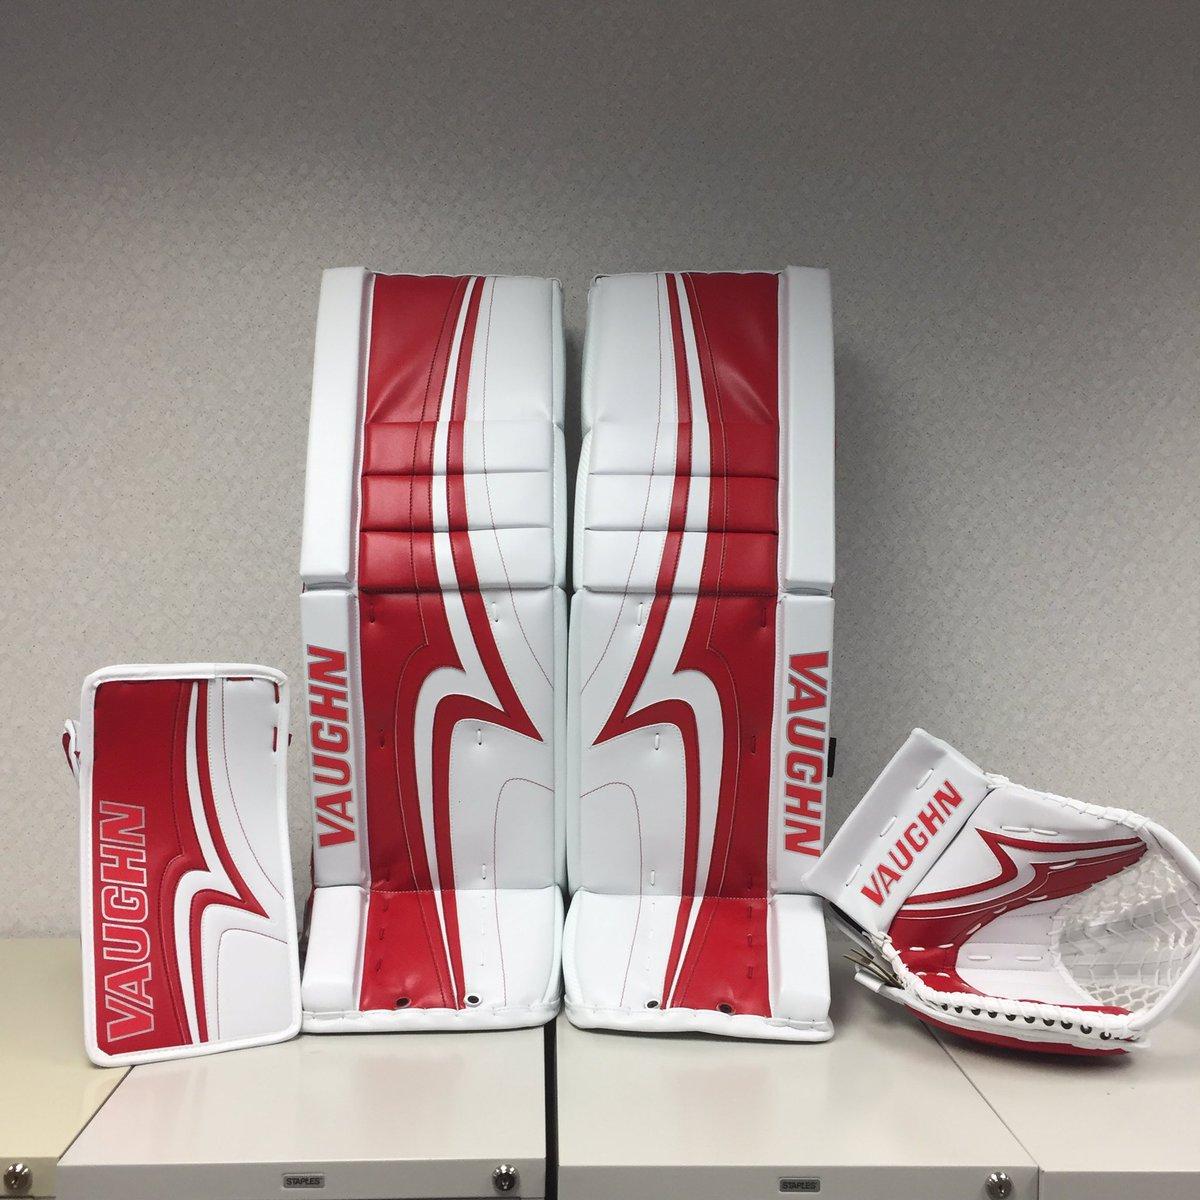 Vaughn Custom Sports on Twitter: